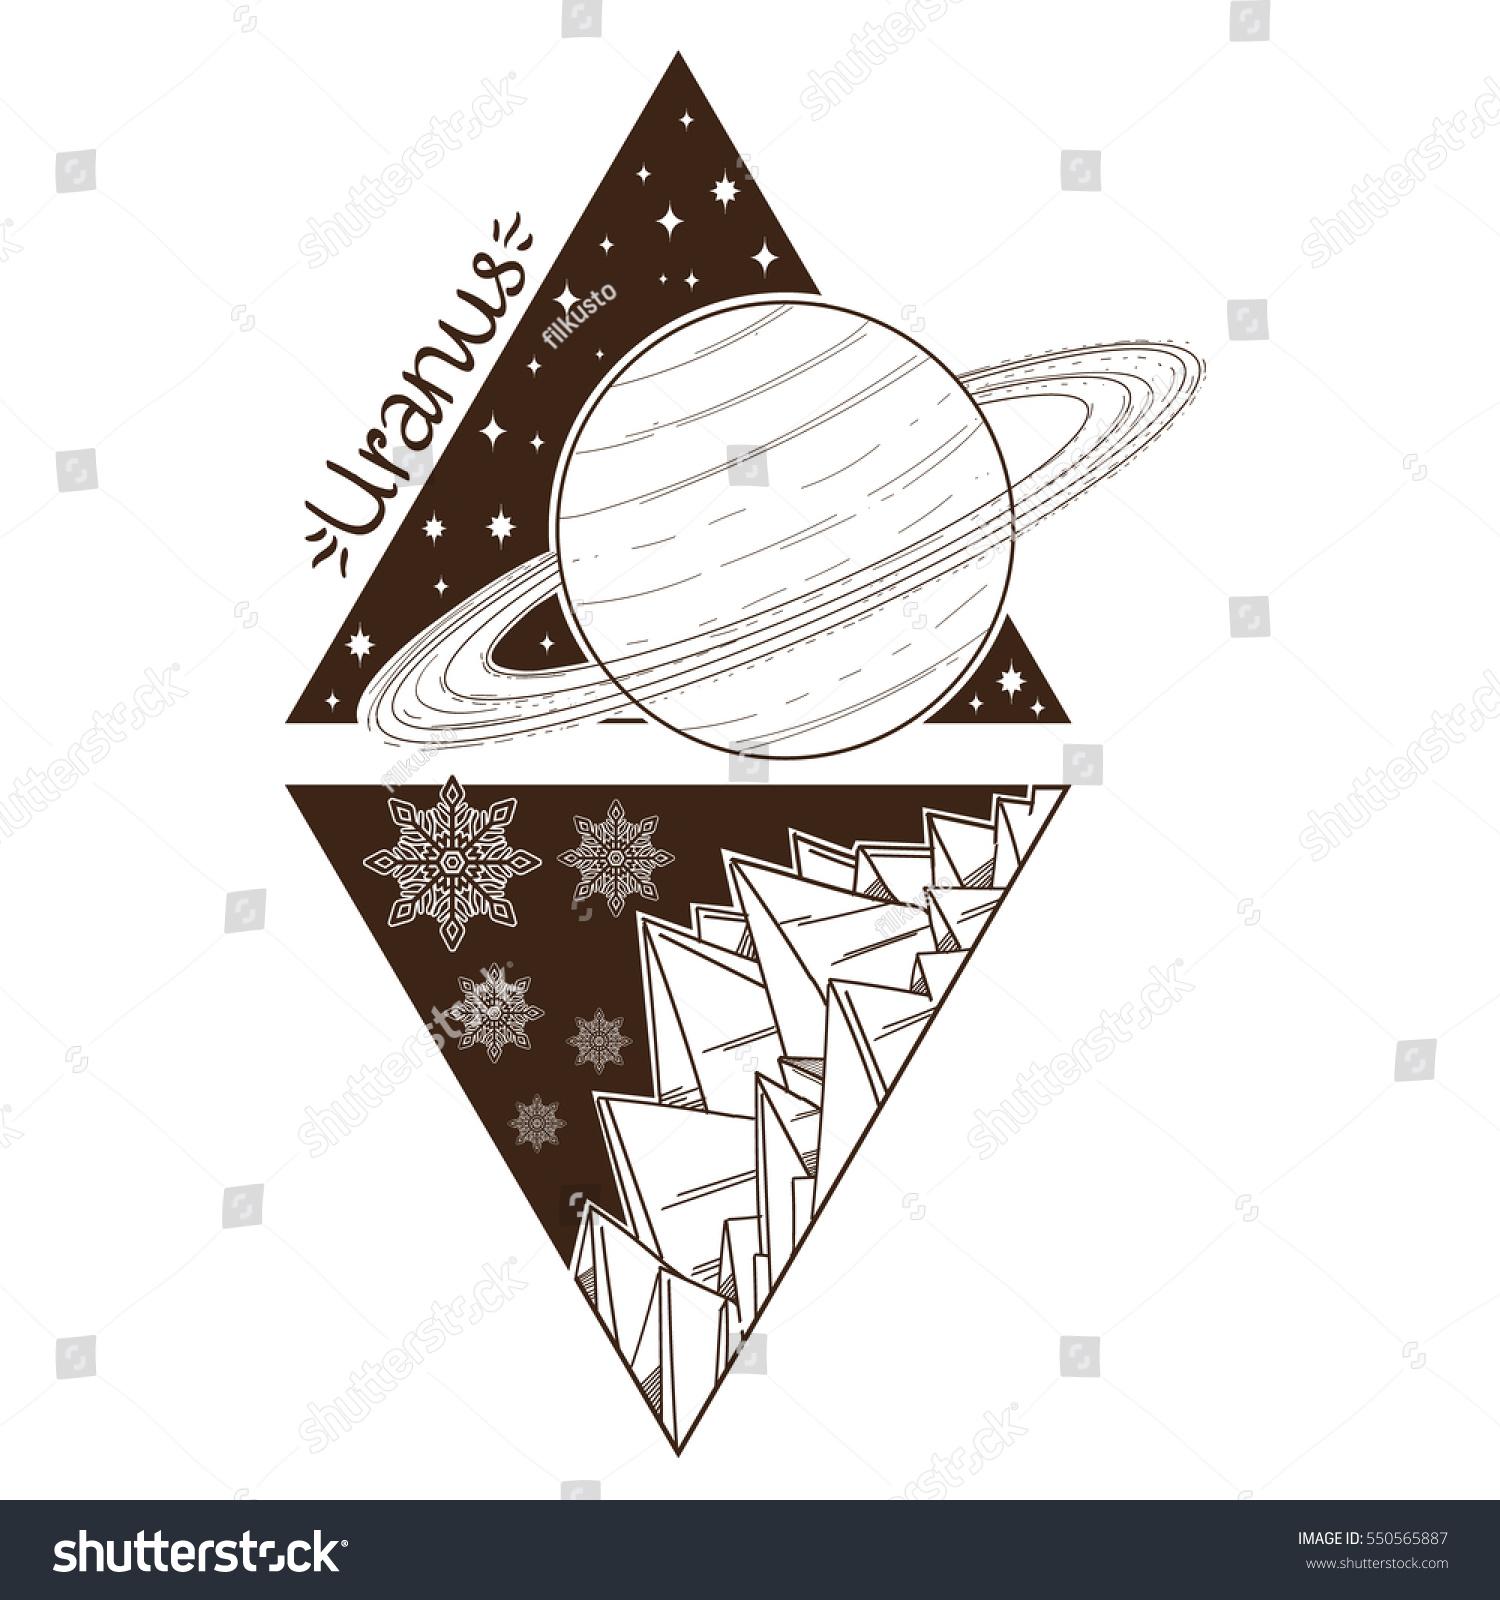 Uranus Planets Stars Solar System Symbols Stock Vector 550565887